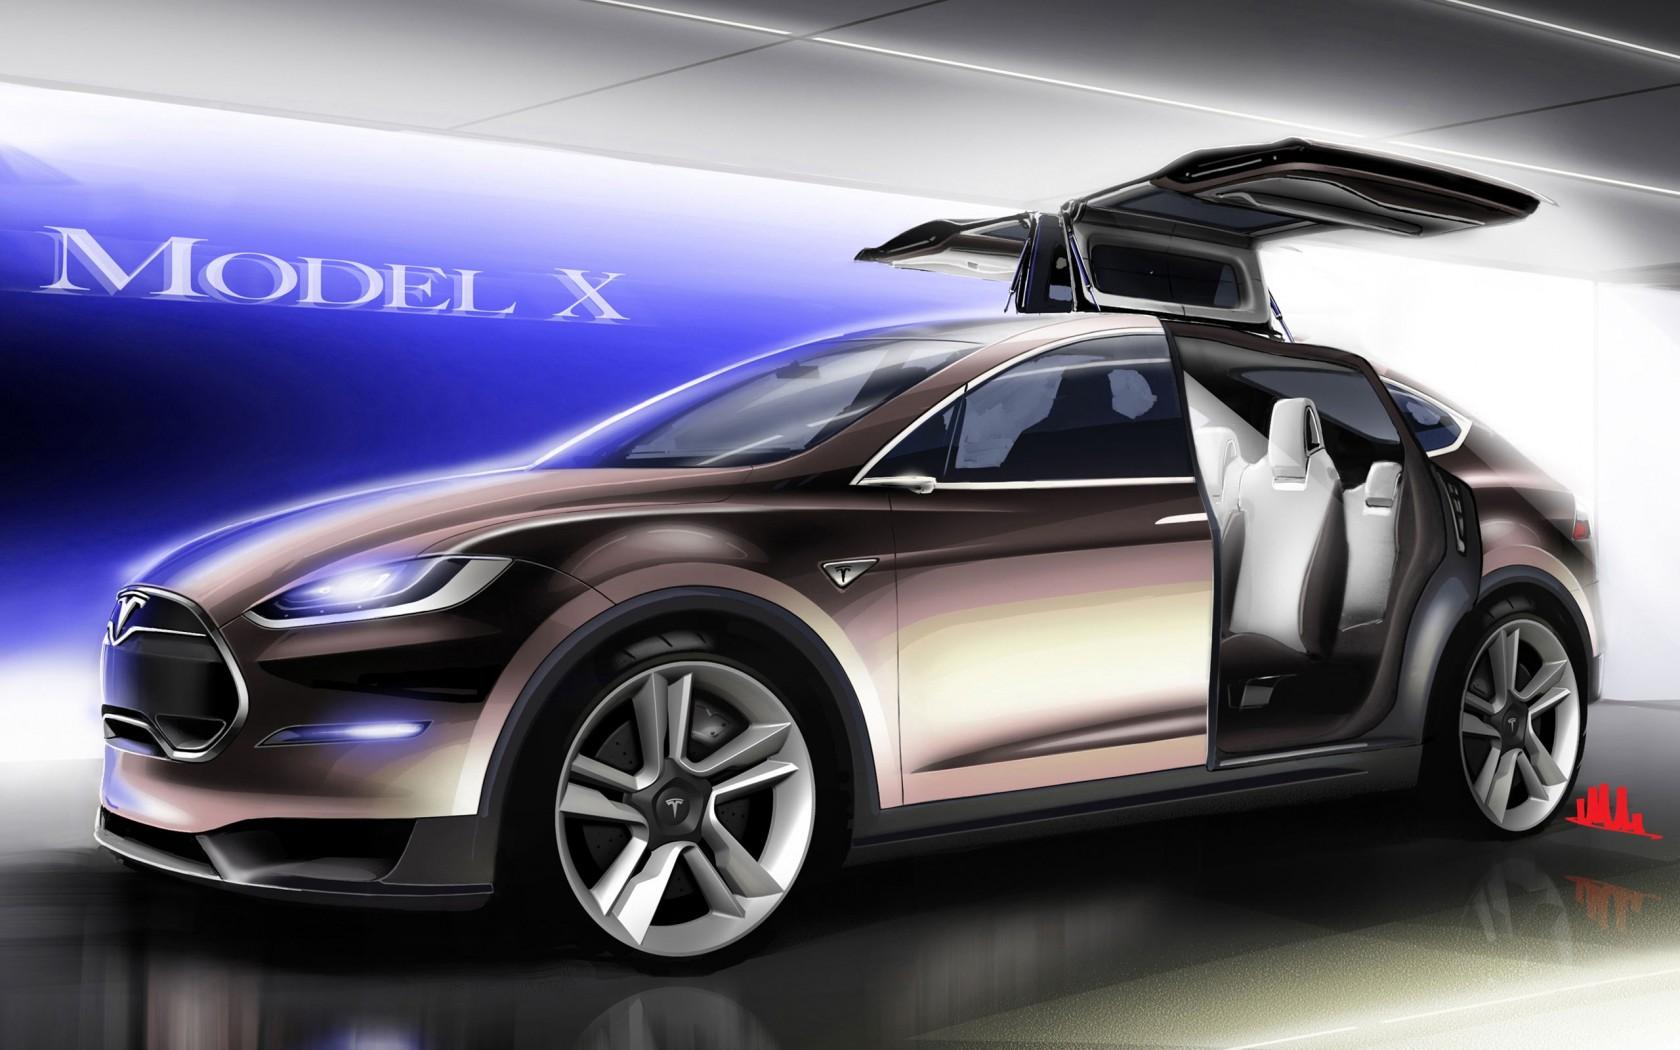 Tesla model x wallpaper hd car wallpapers id 3202 - Tesla wallpaper android ...